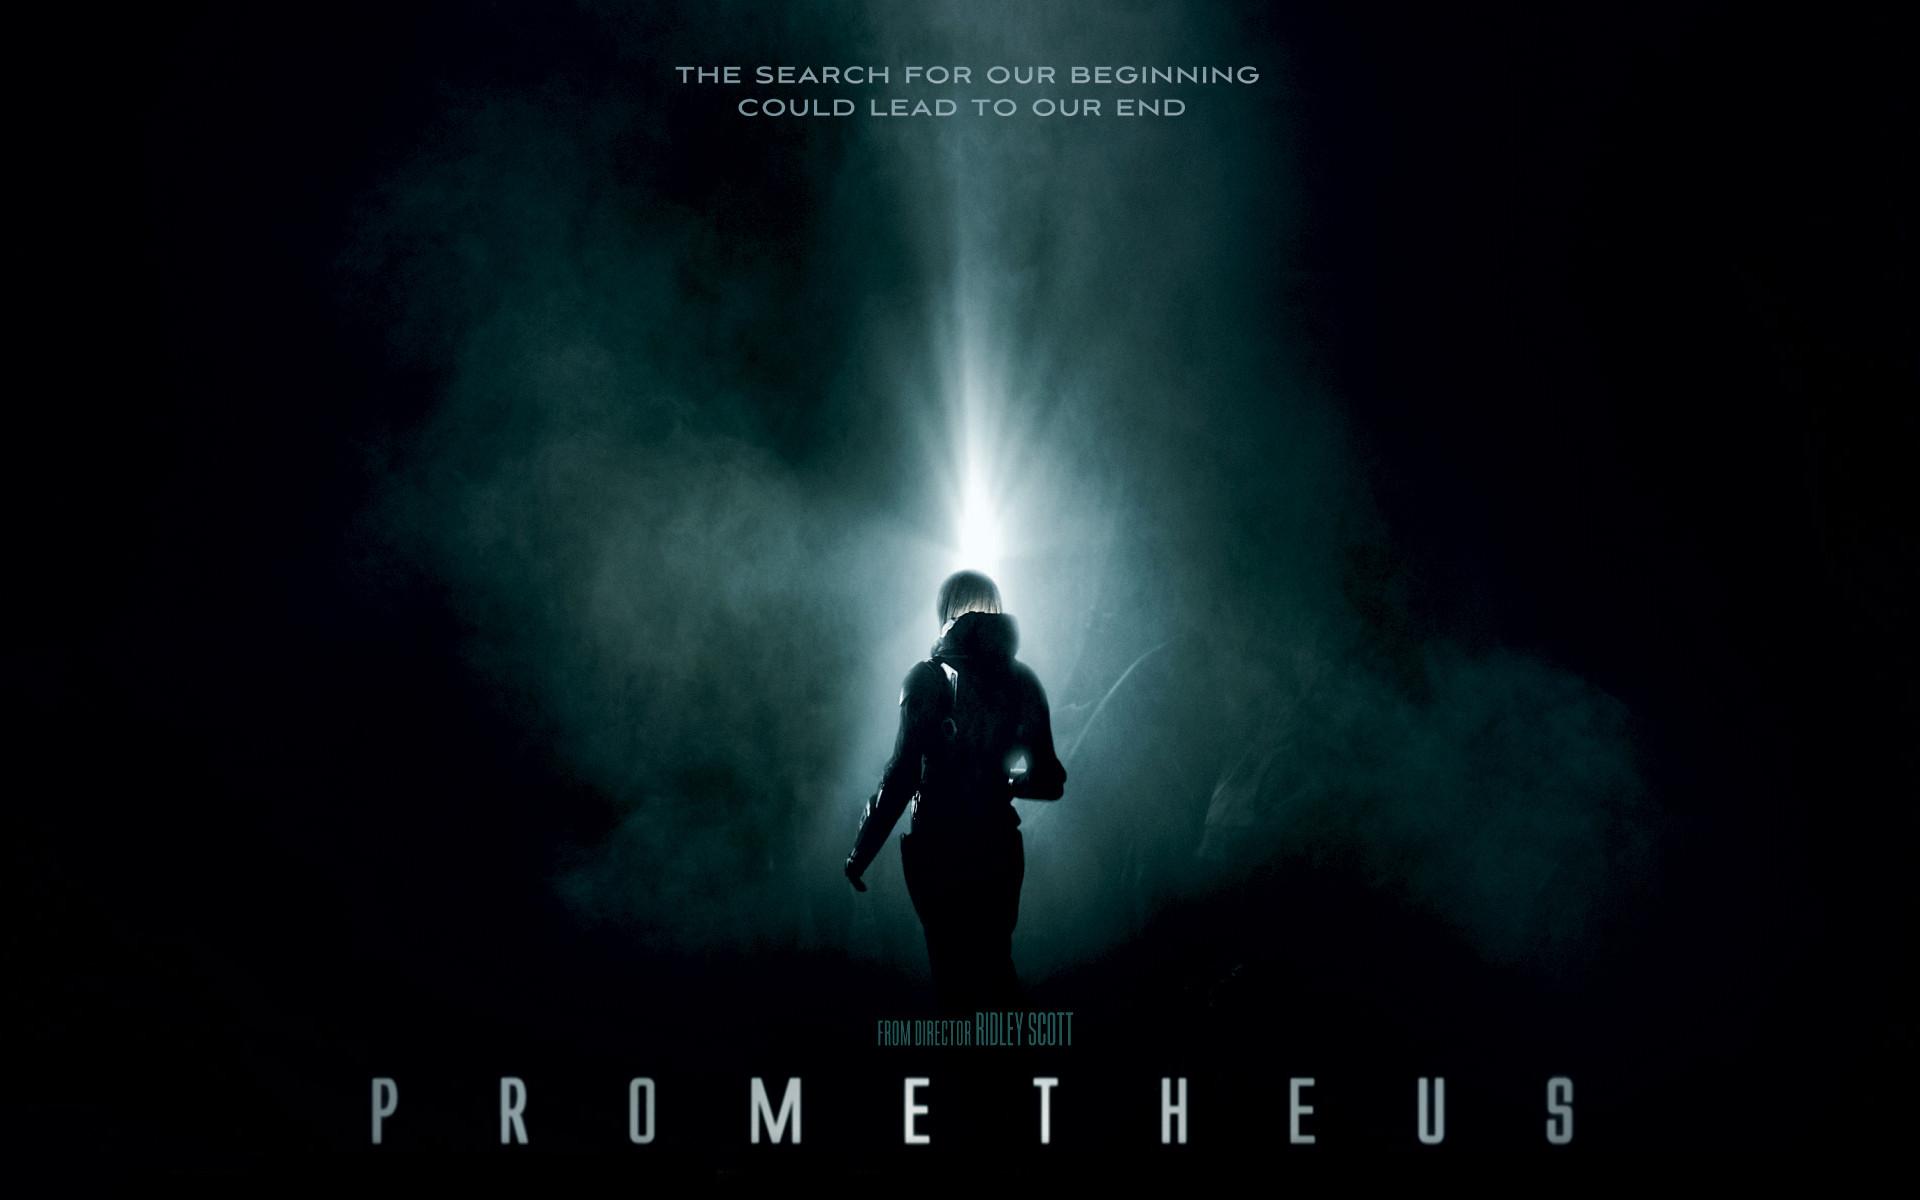 Prometheus - Prometheus (2012 film) Fan Art (31067621 ...